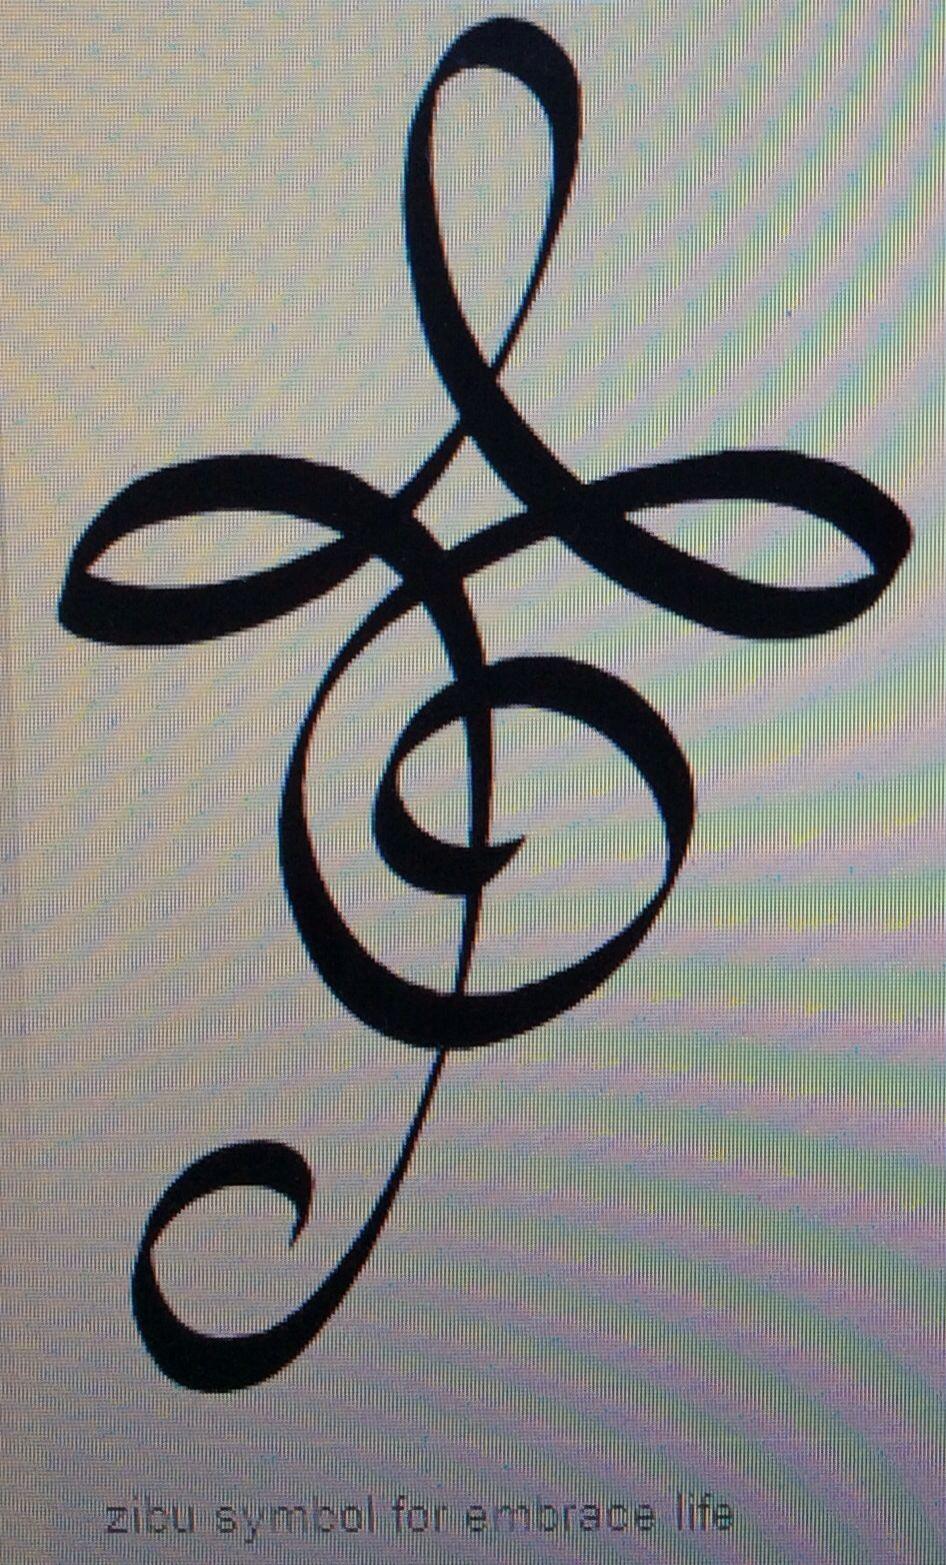 Zibu Symbol For Embrace Life Words Pinterest Tattoo Tatoos